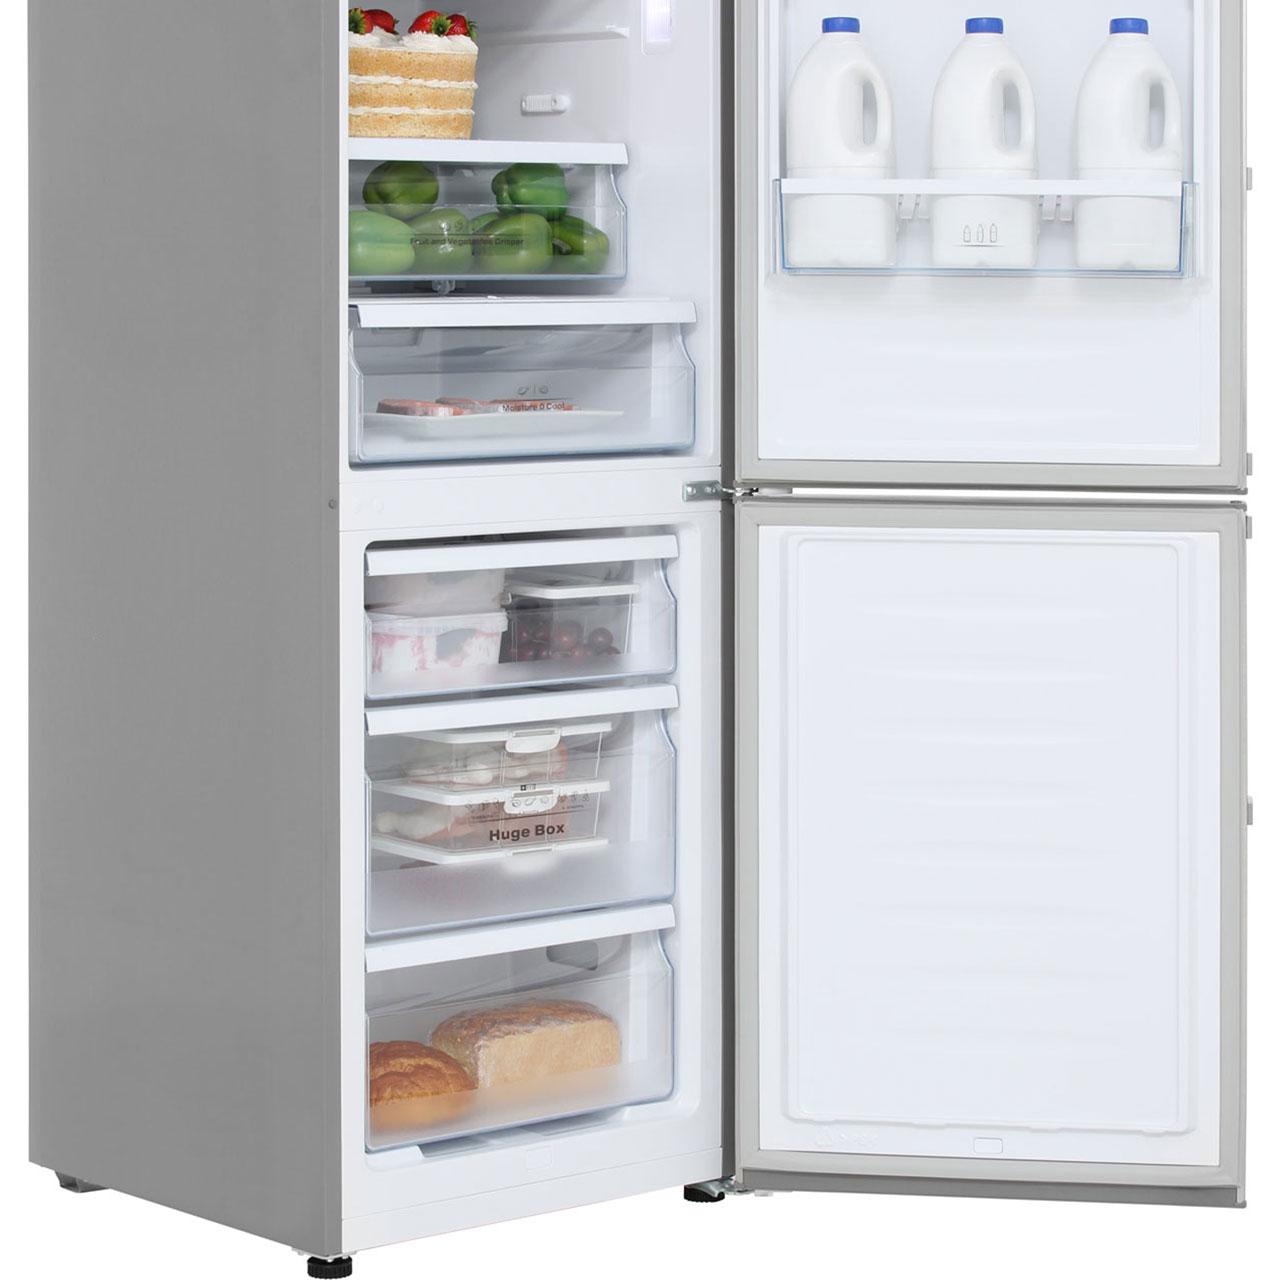 Huge Refrigerator Hisense Rb403n4ac2 60 40 Frost Free Fridge Freezer Stainless